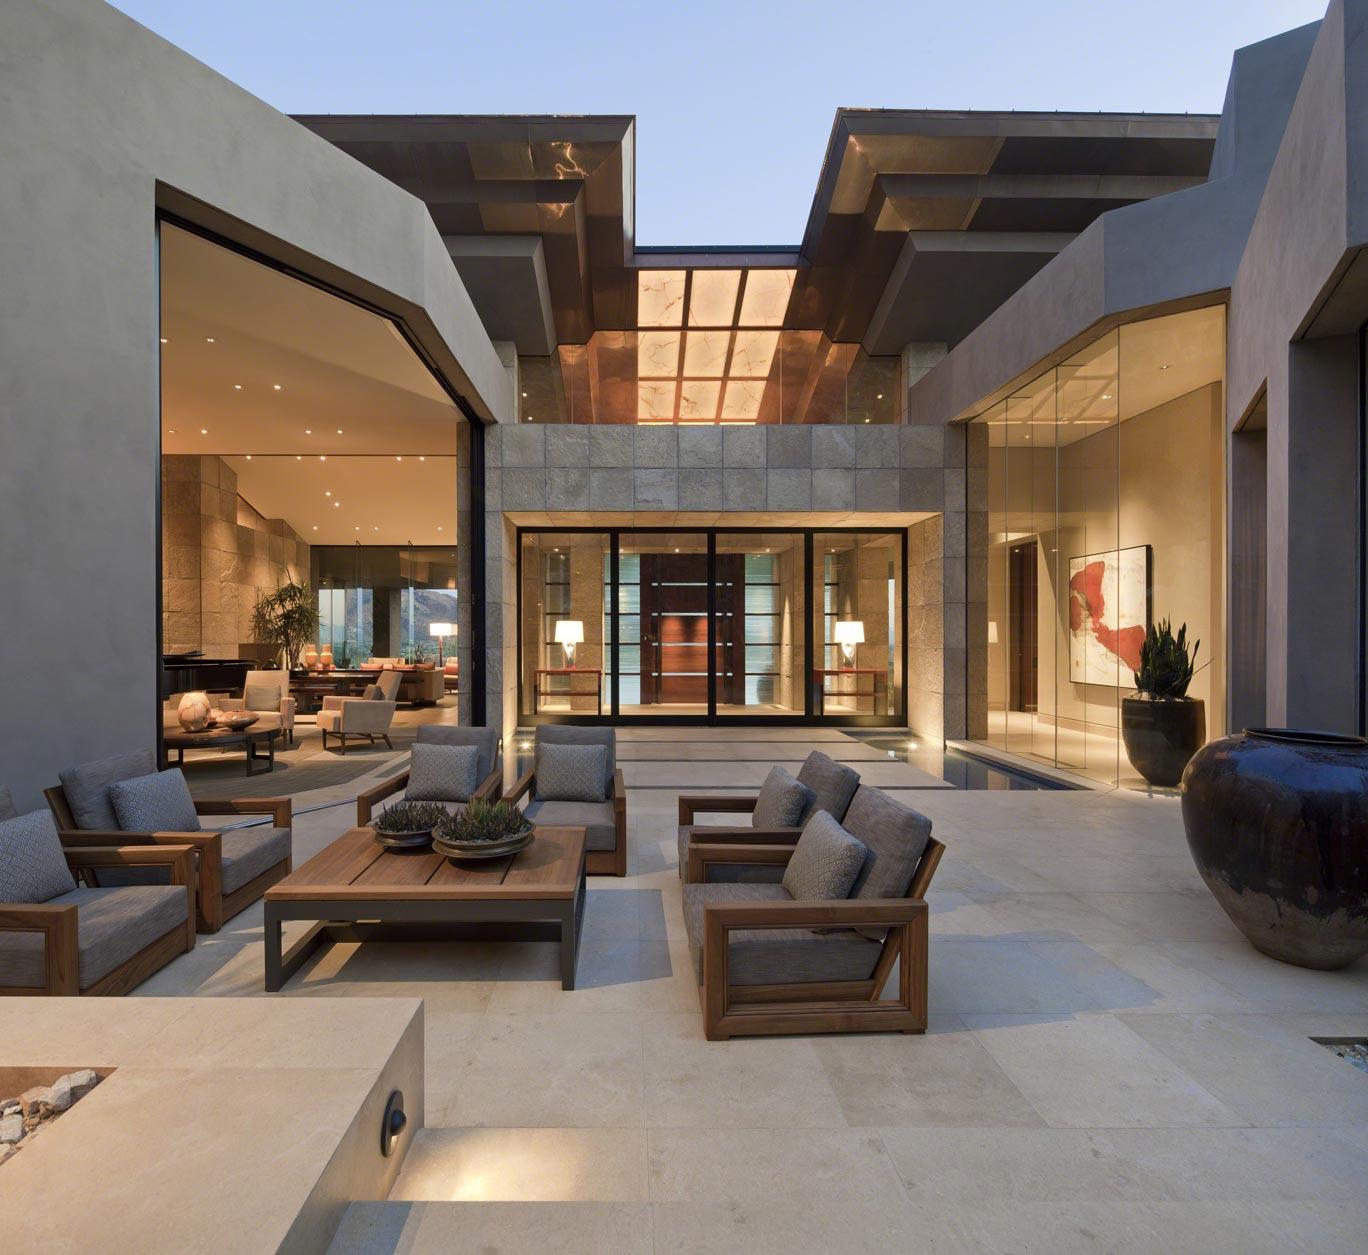 Contemporary Outdoor Living Design in Phoenix ǀ David ... on Designer Outdoor Living  id=50553